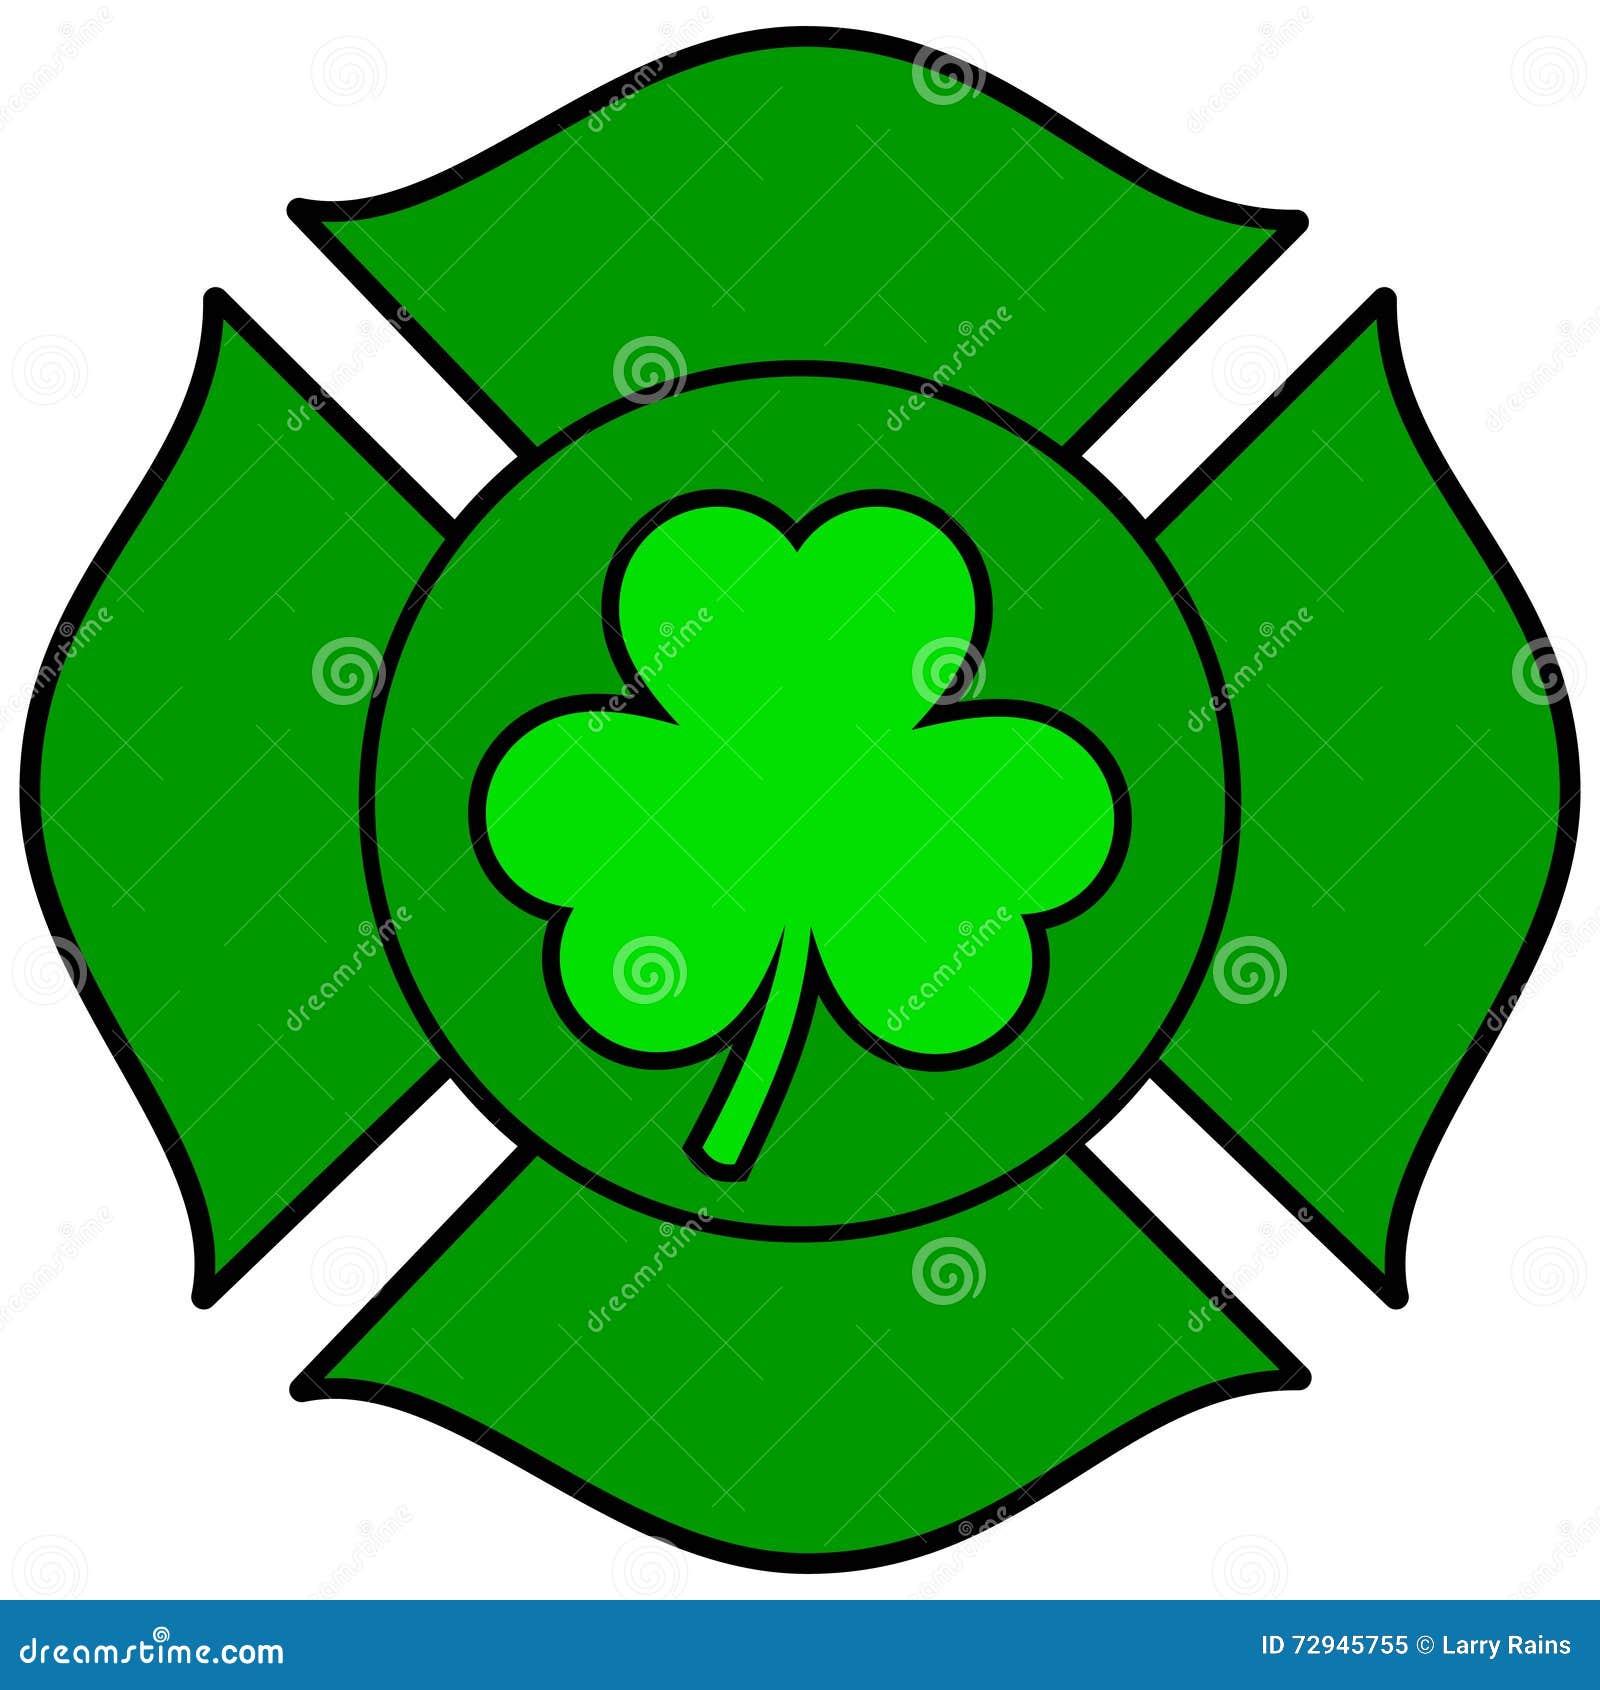 Irish firefighter maltese cross stock vector illustration of irish firefighter maltese cross biocorpaavc